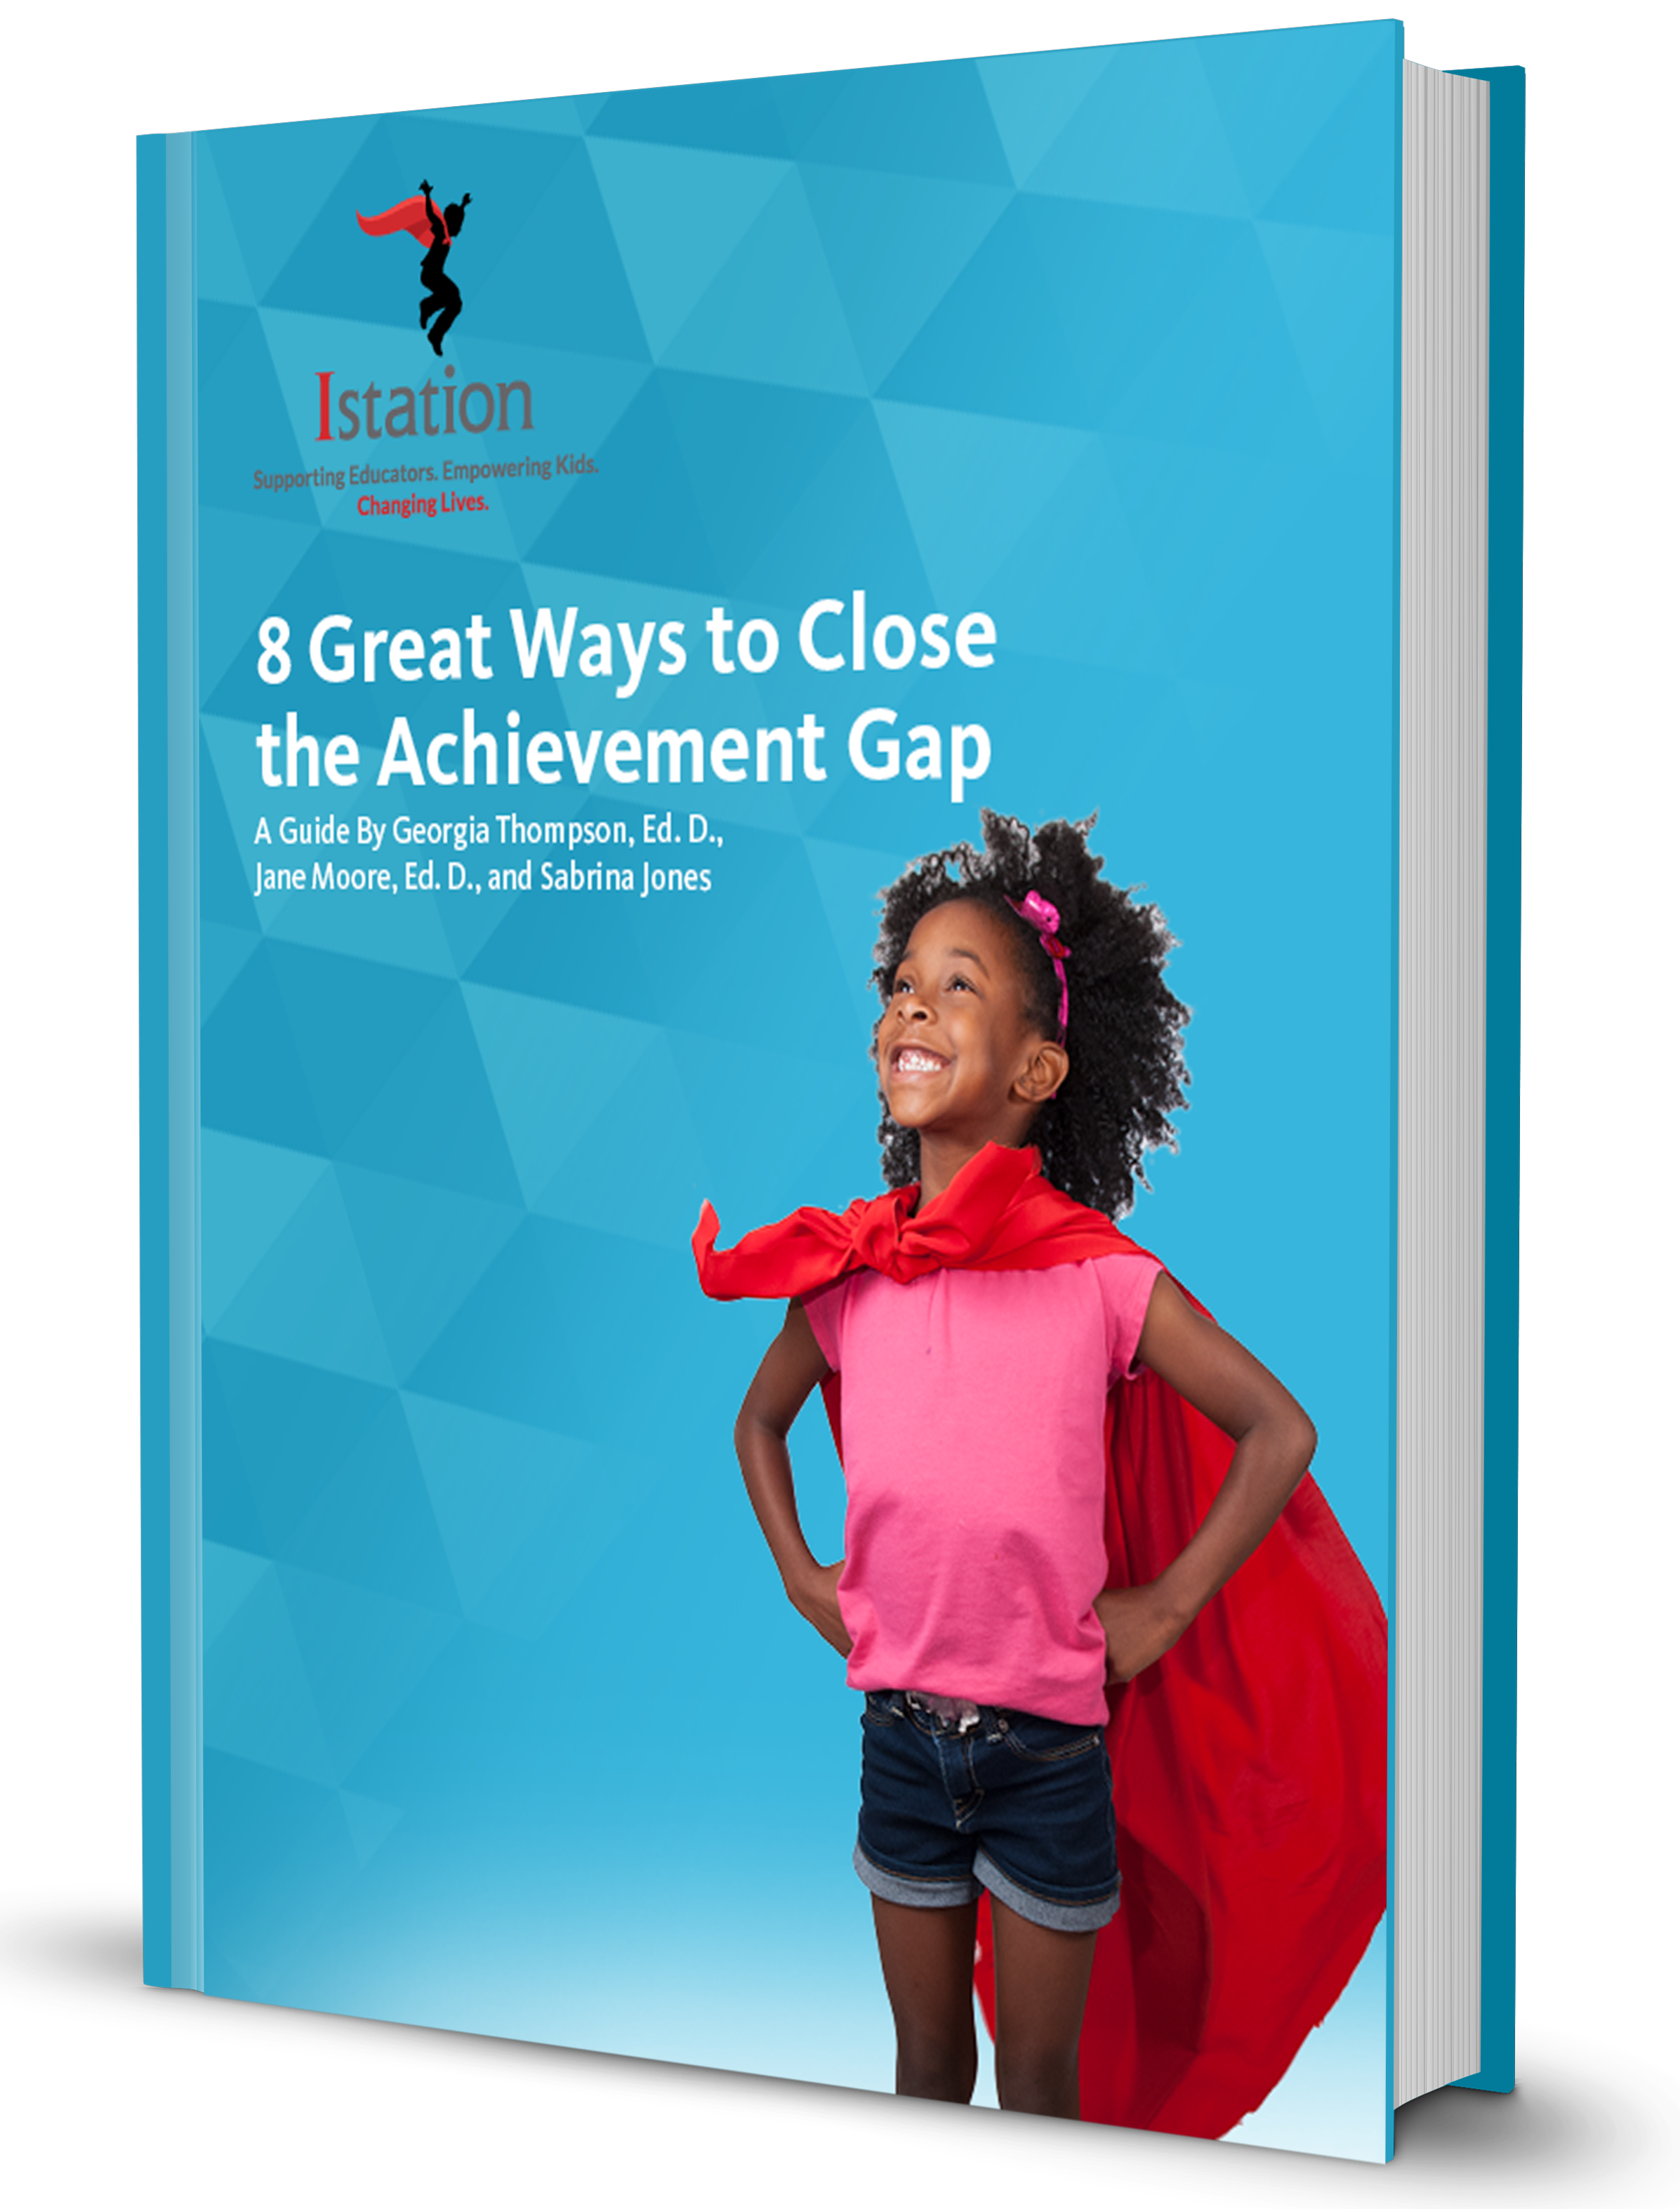 achievementgapebook.png